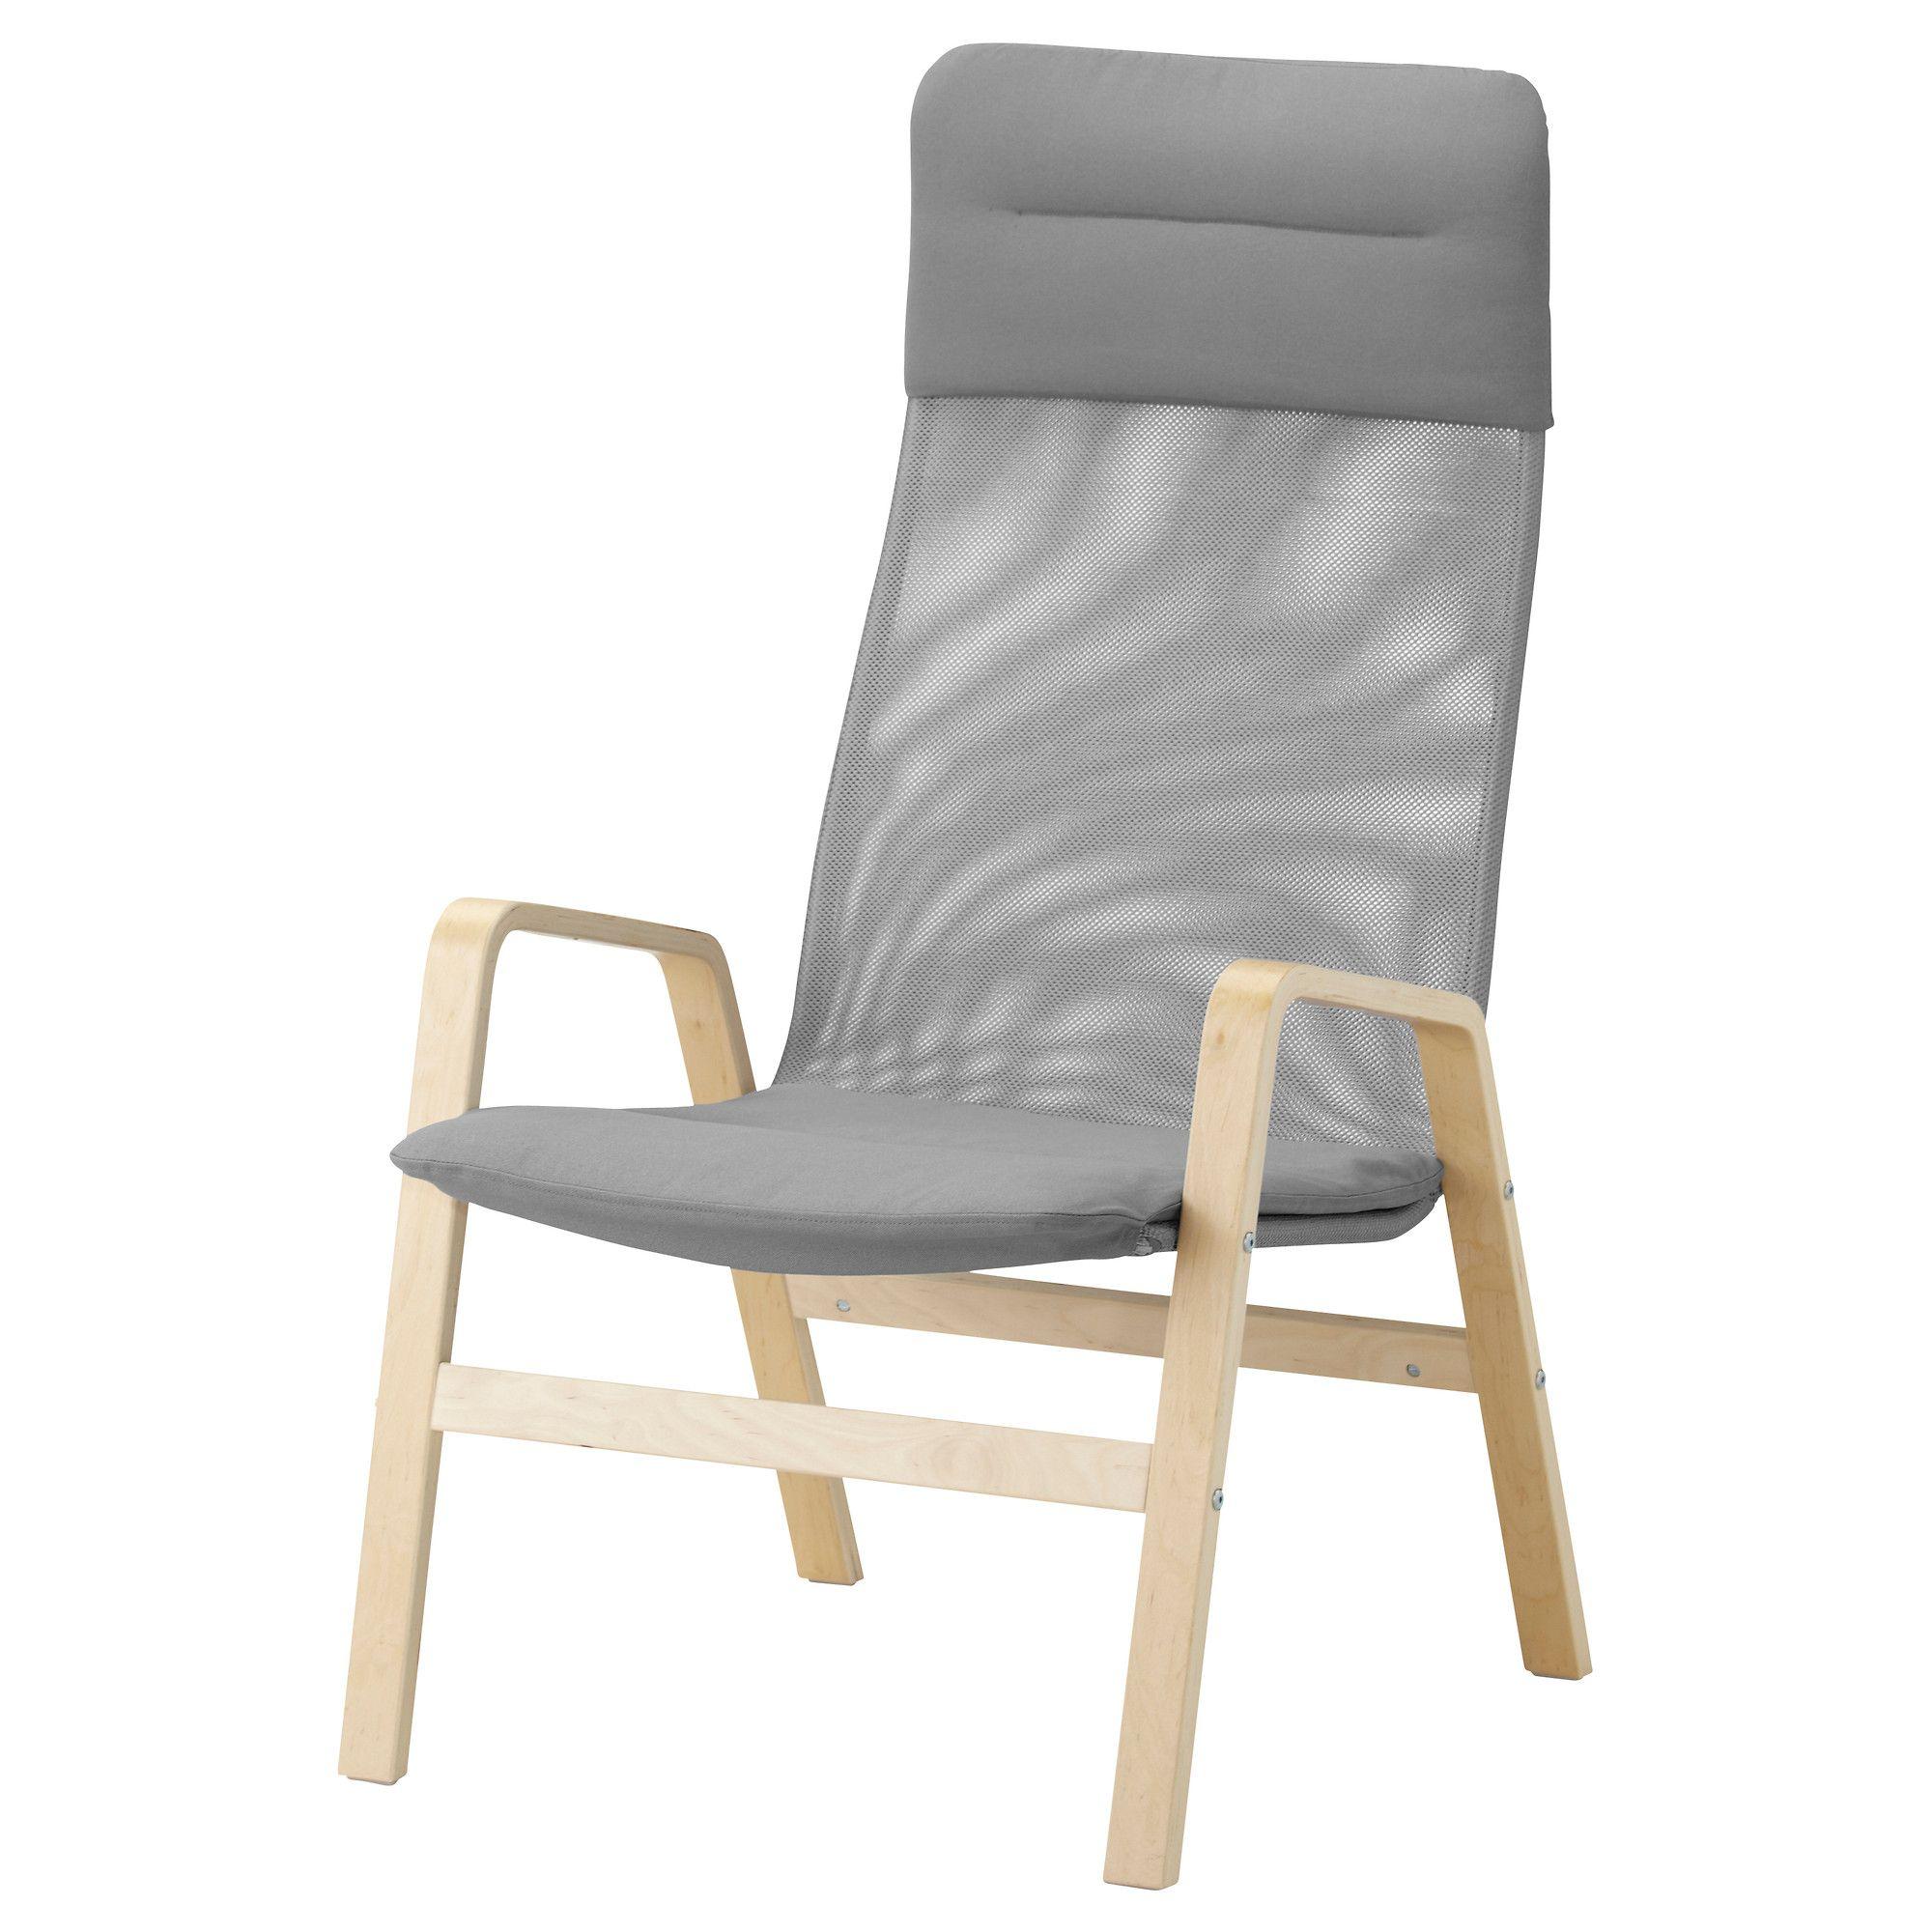 NOLBYN Chair high birch veneer/gray IKEA Ikea